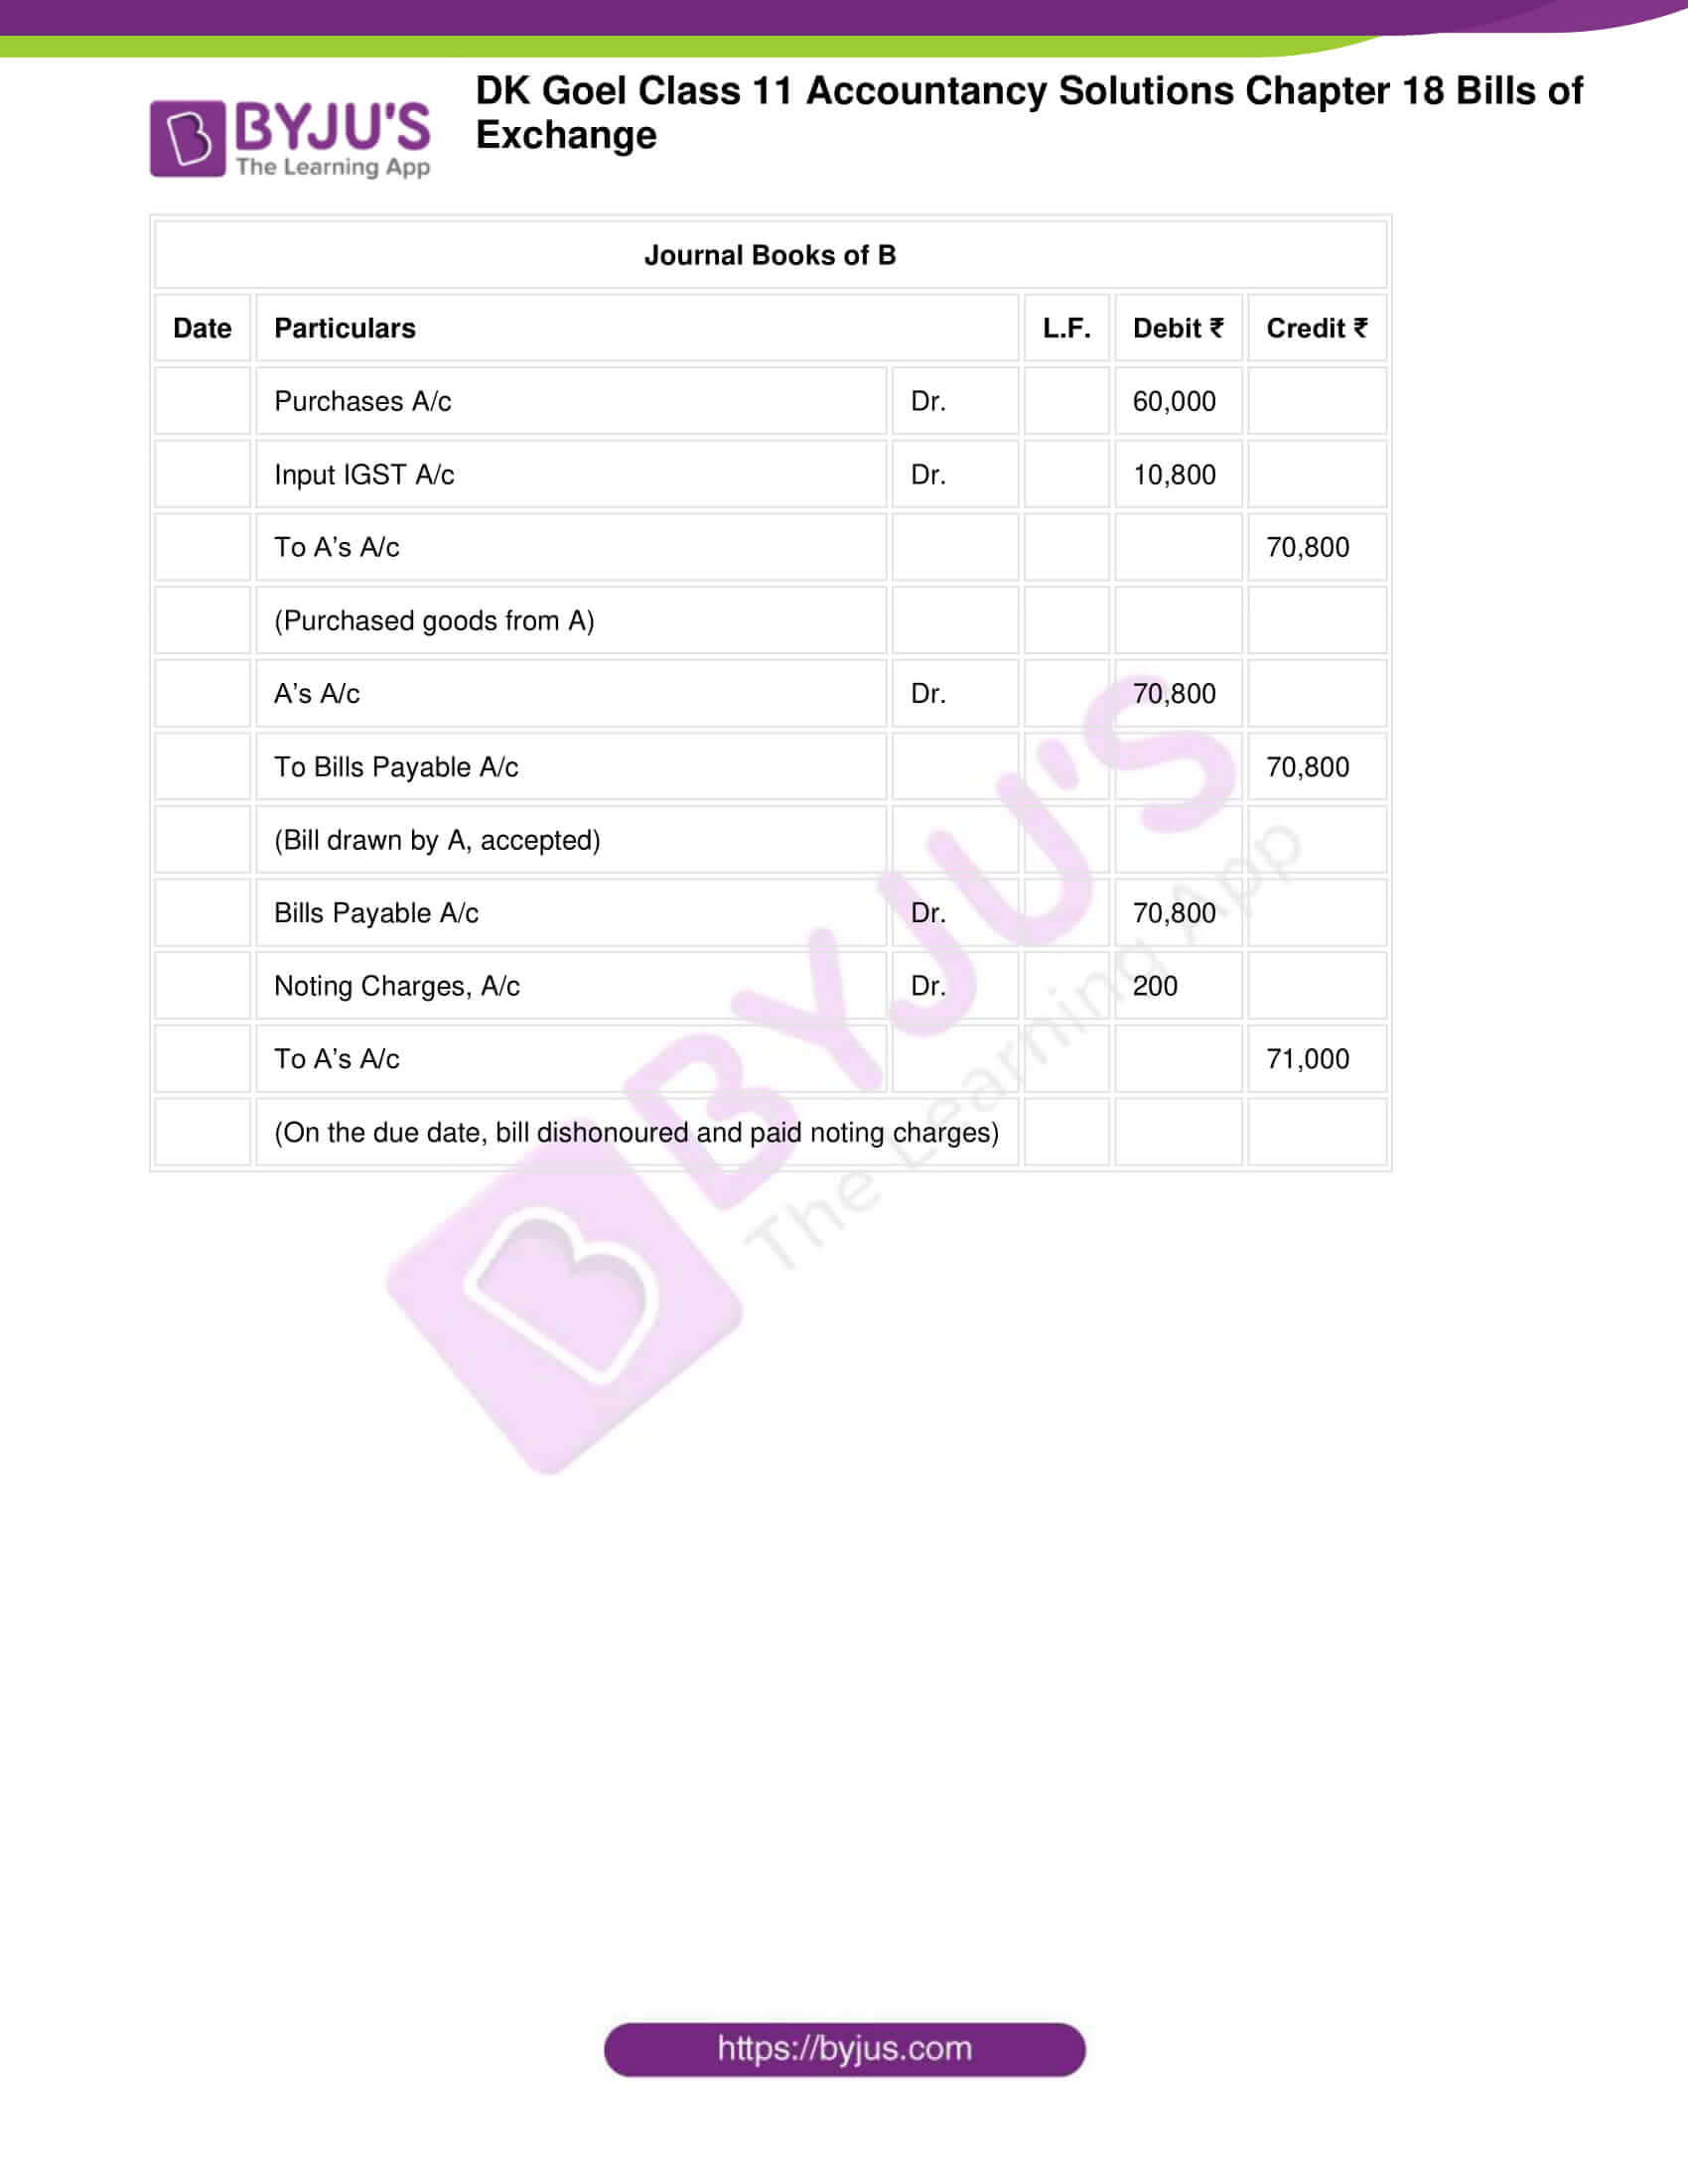 dk goel class 11 accountancy solutions chapter 18 070